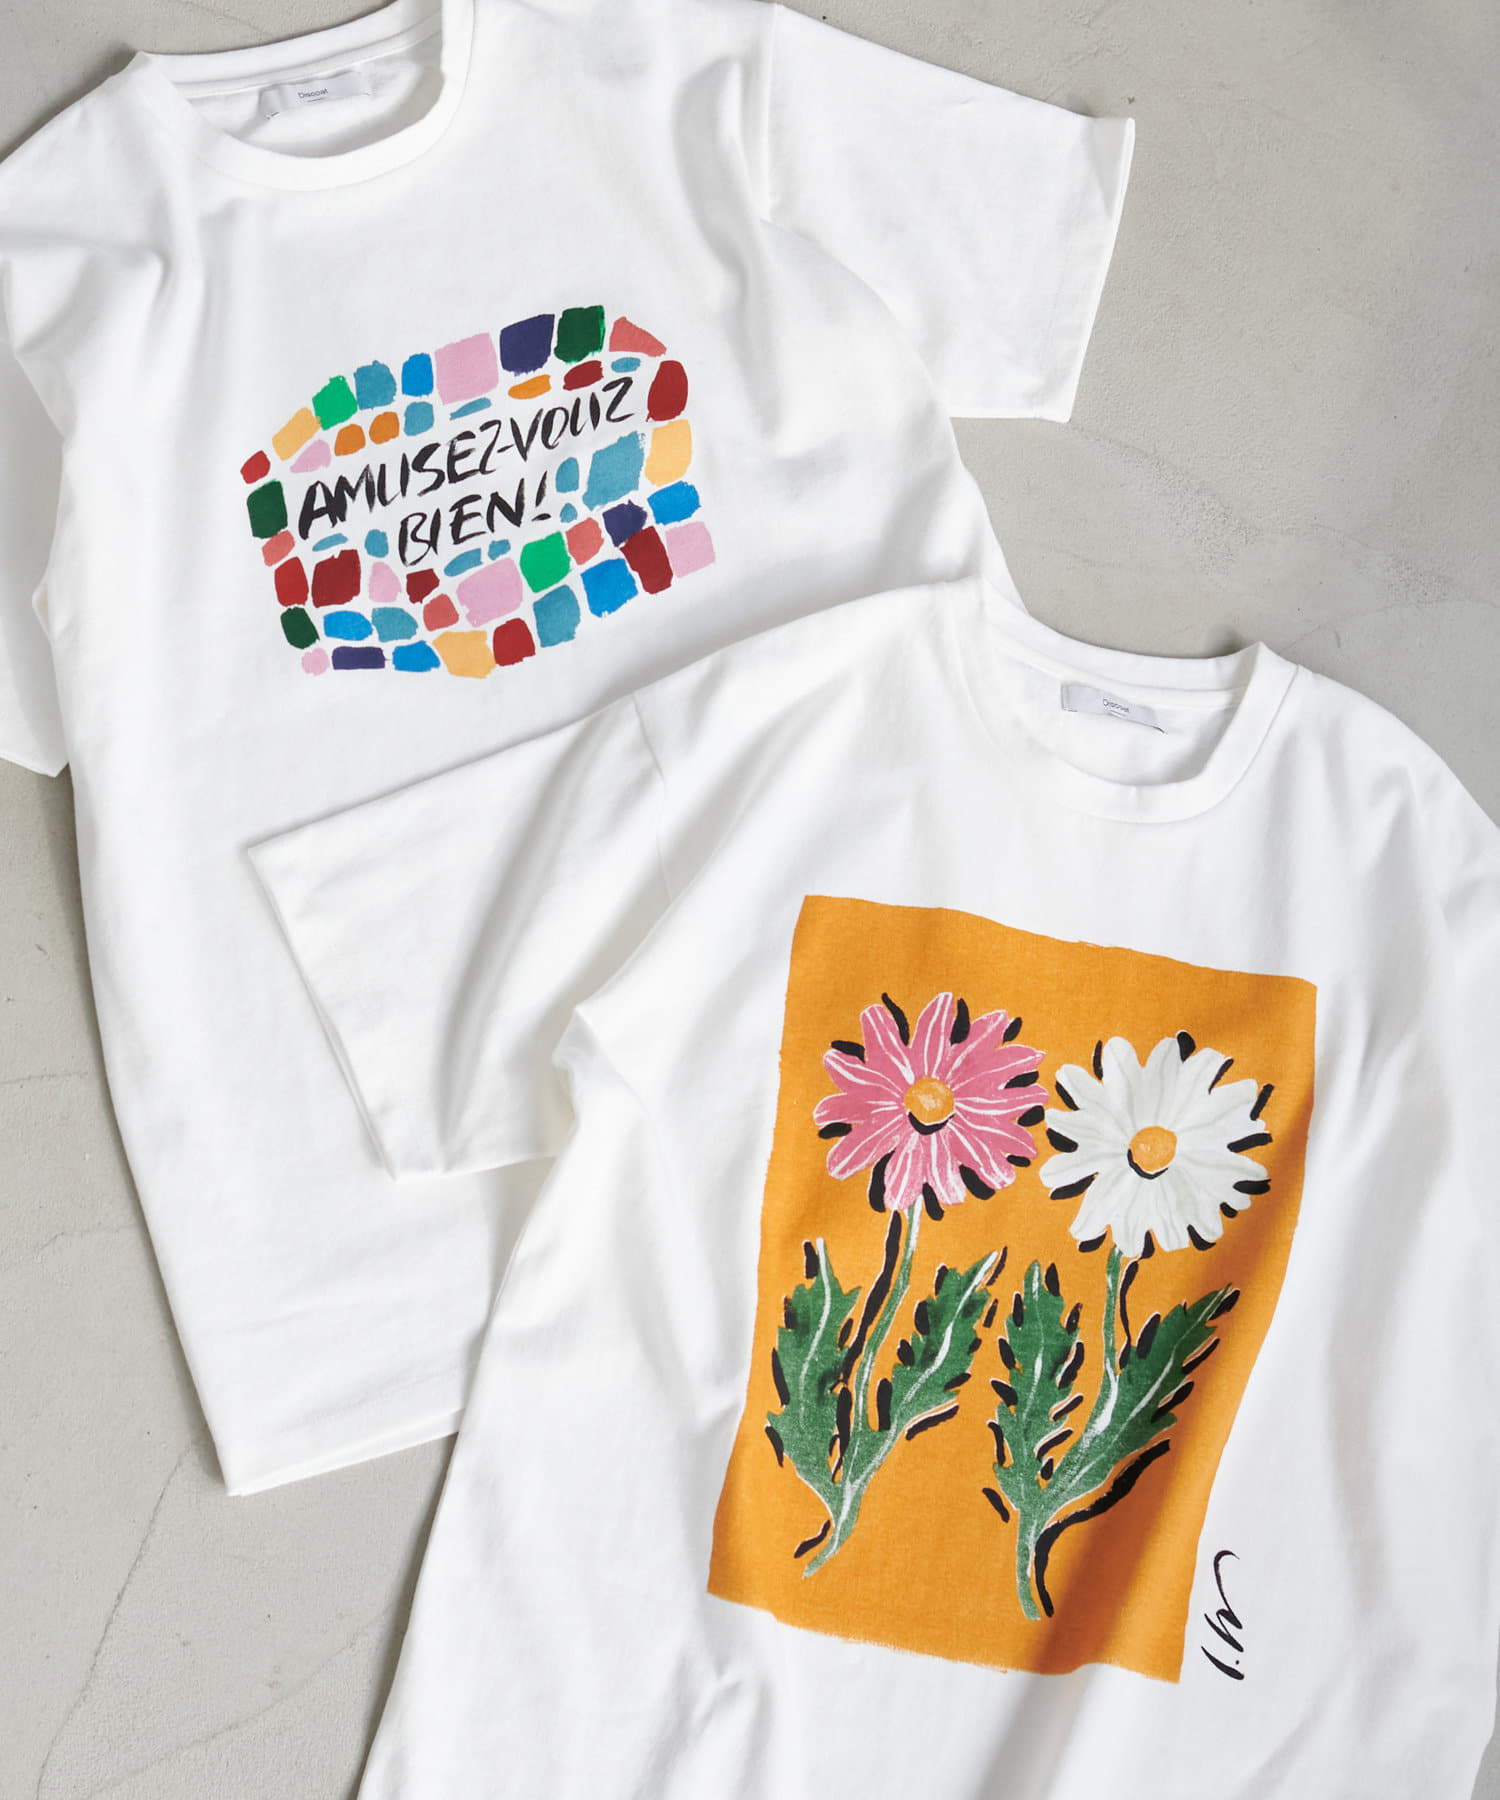 Discoat(ディスコート) LEE IZUMIDA × DISCOAT コラボTシャツ【ユニセックス】